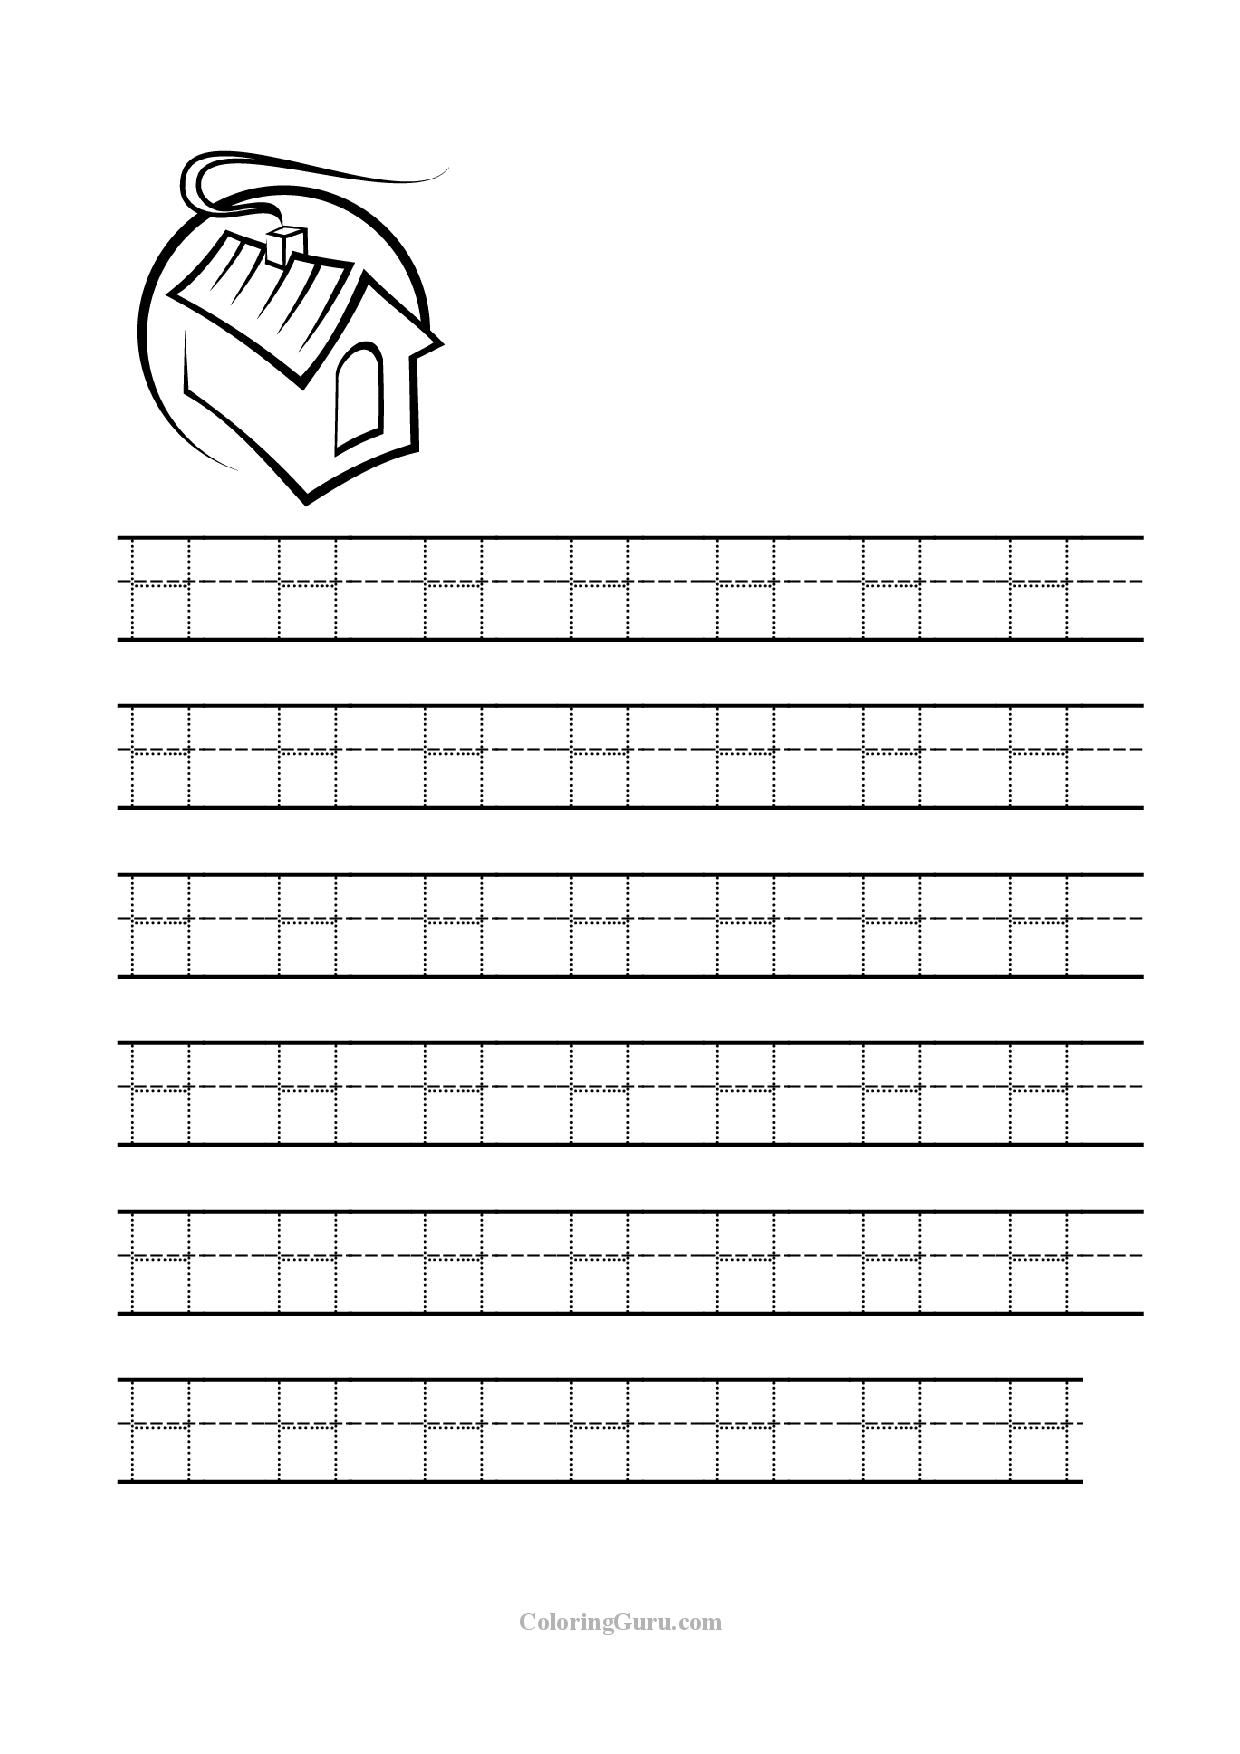 Letter H Tracing Worksheets Worksheets For All | Tracing within Free Tracing Letter H Worksheets